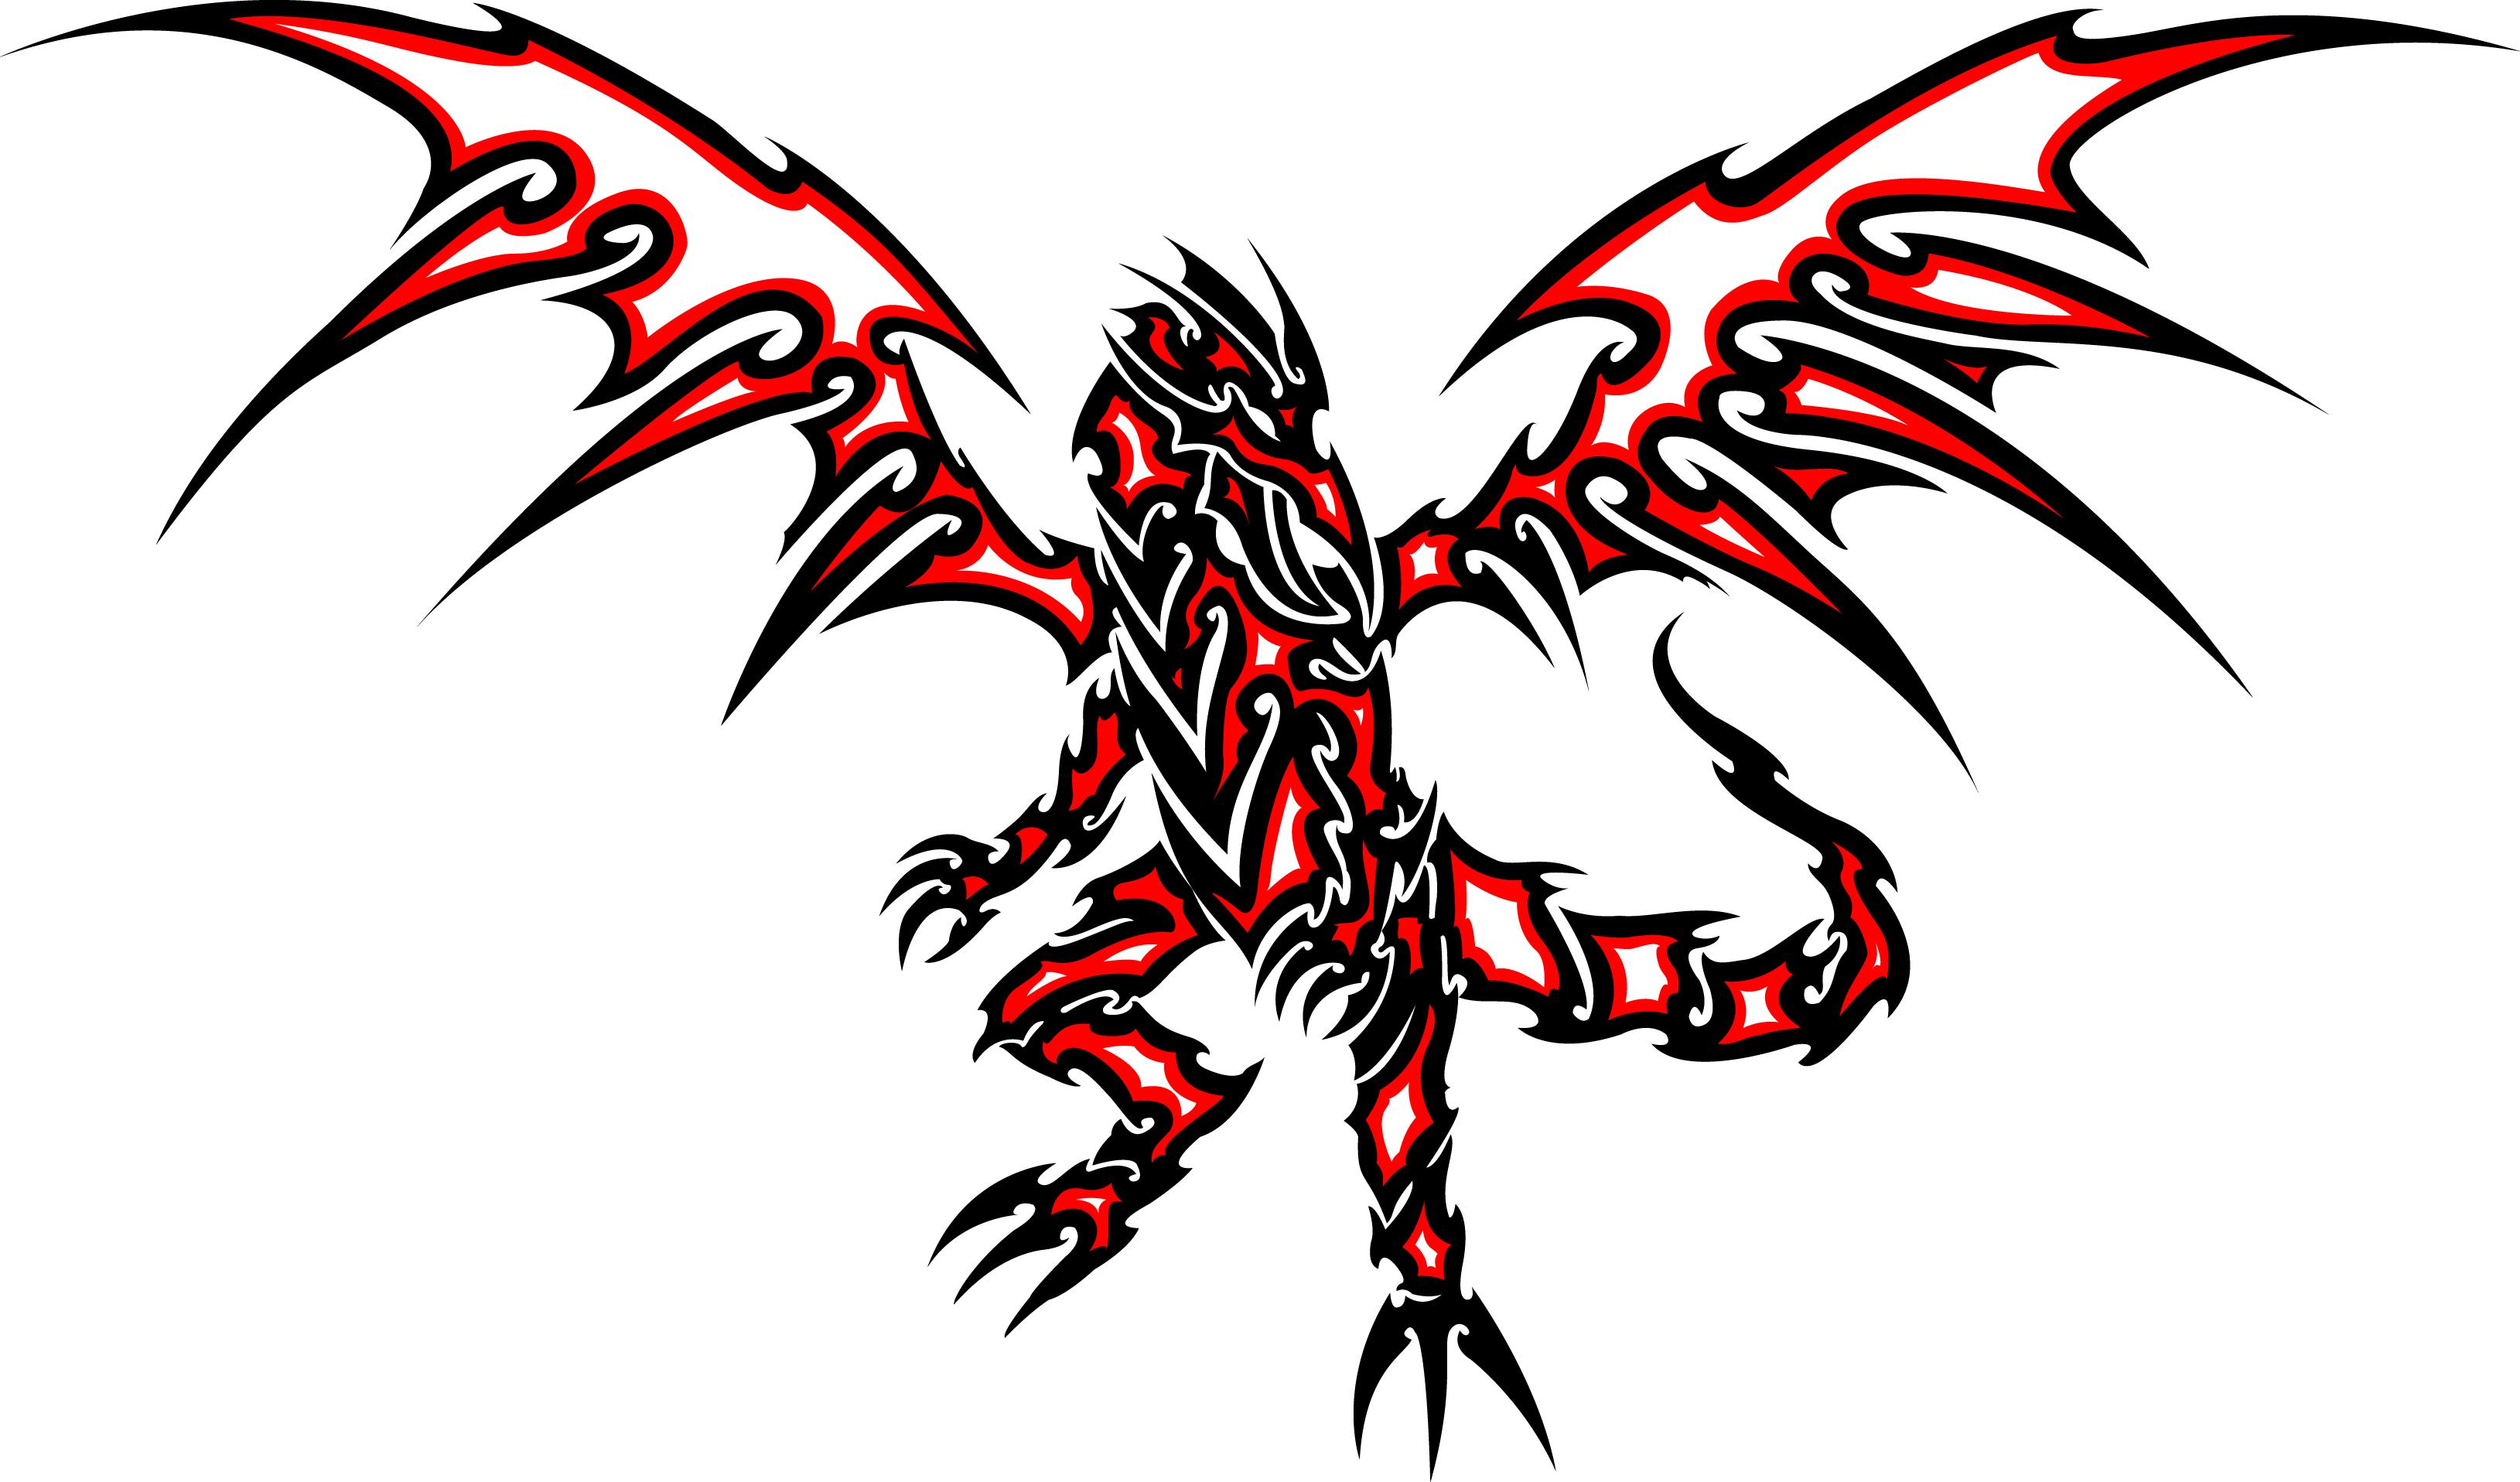 Dragon Tattoo Hd Wallpapers Free Download Red Eyes Black Dragon